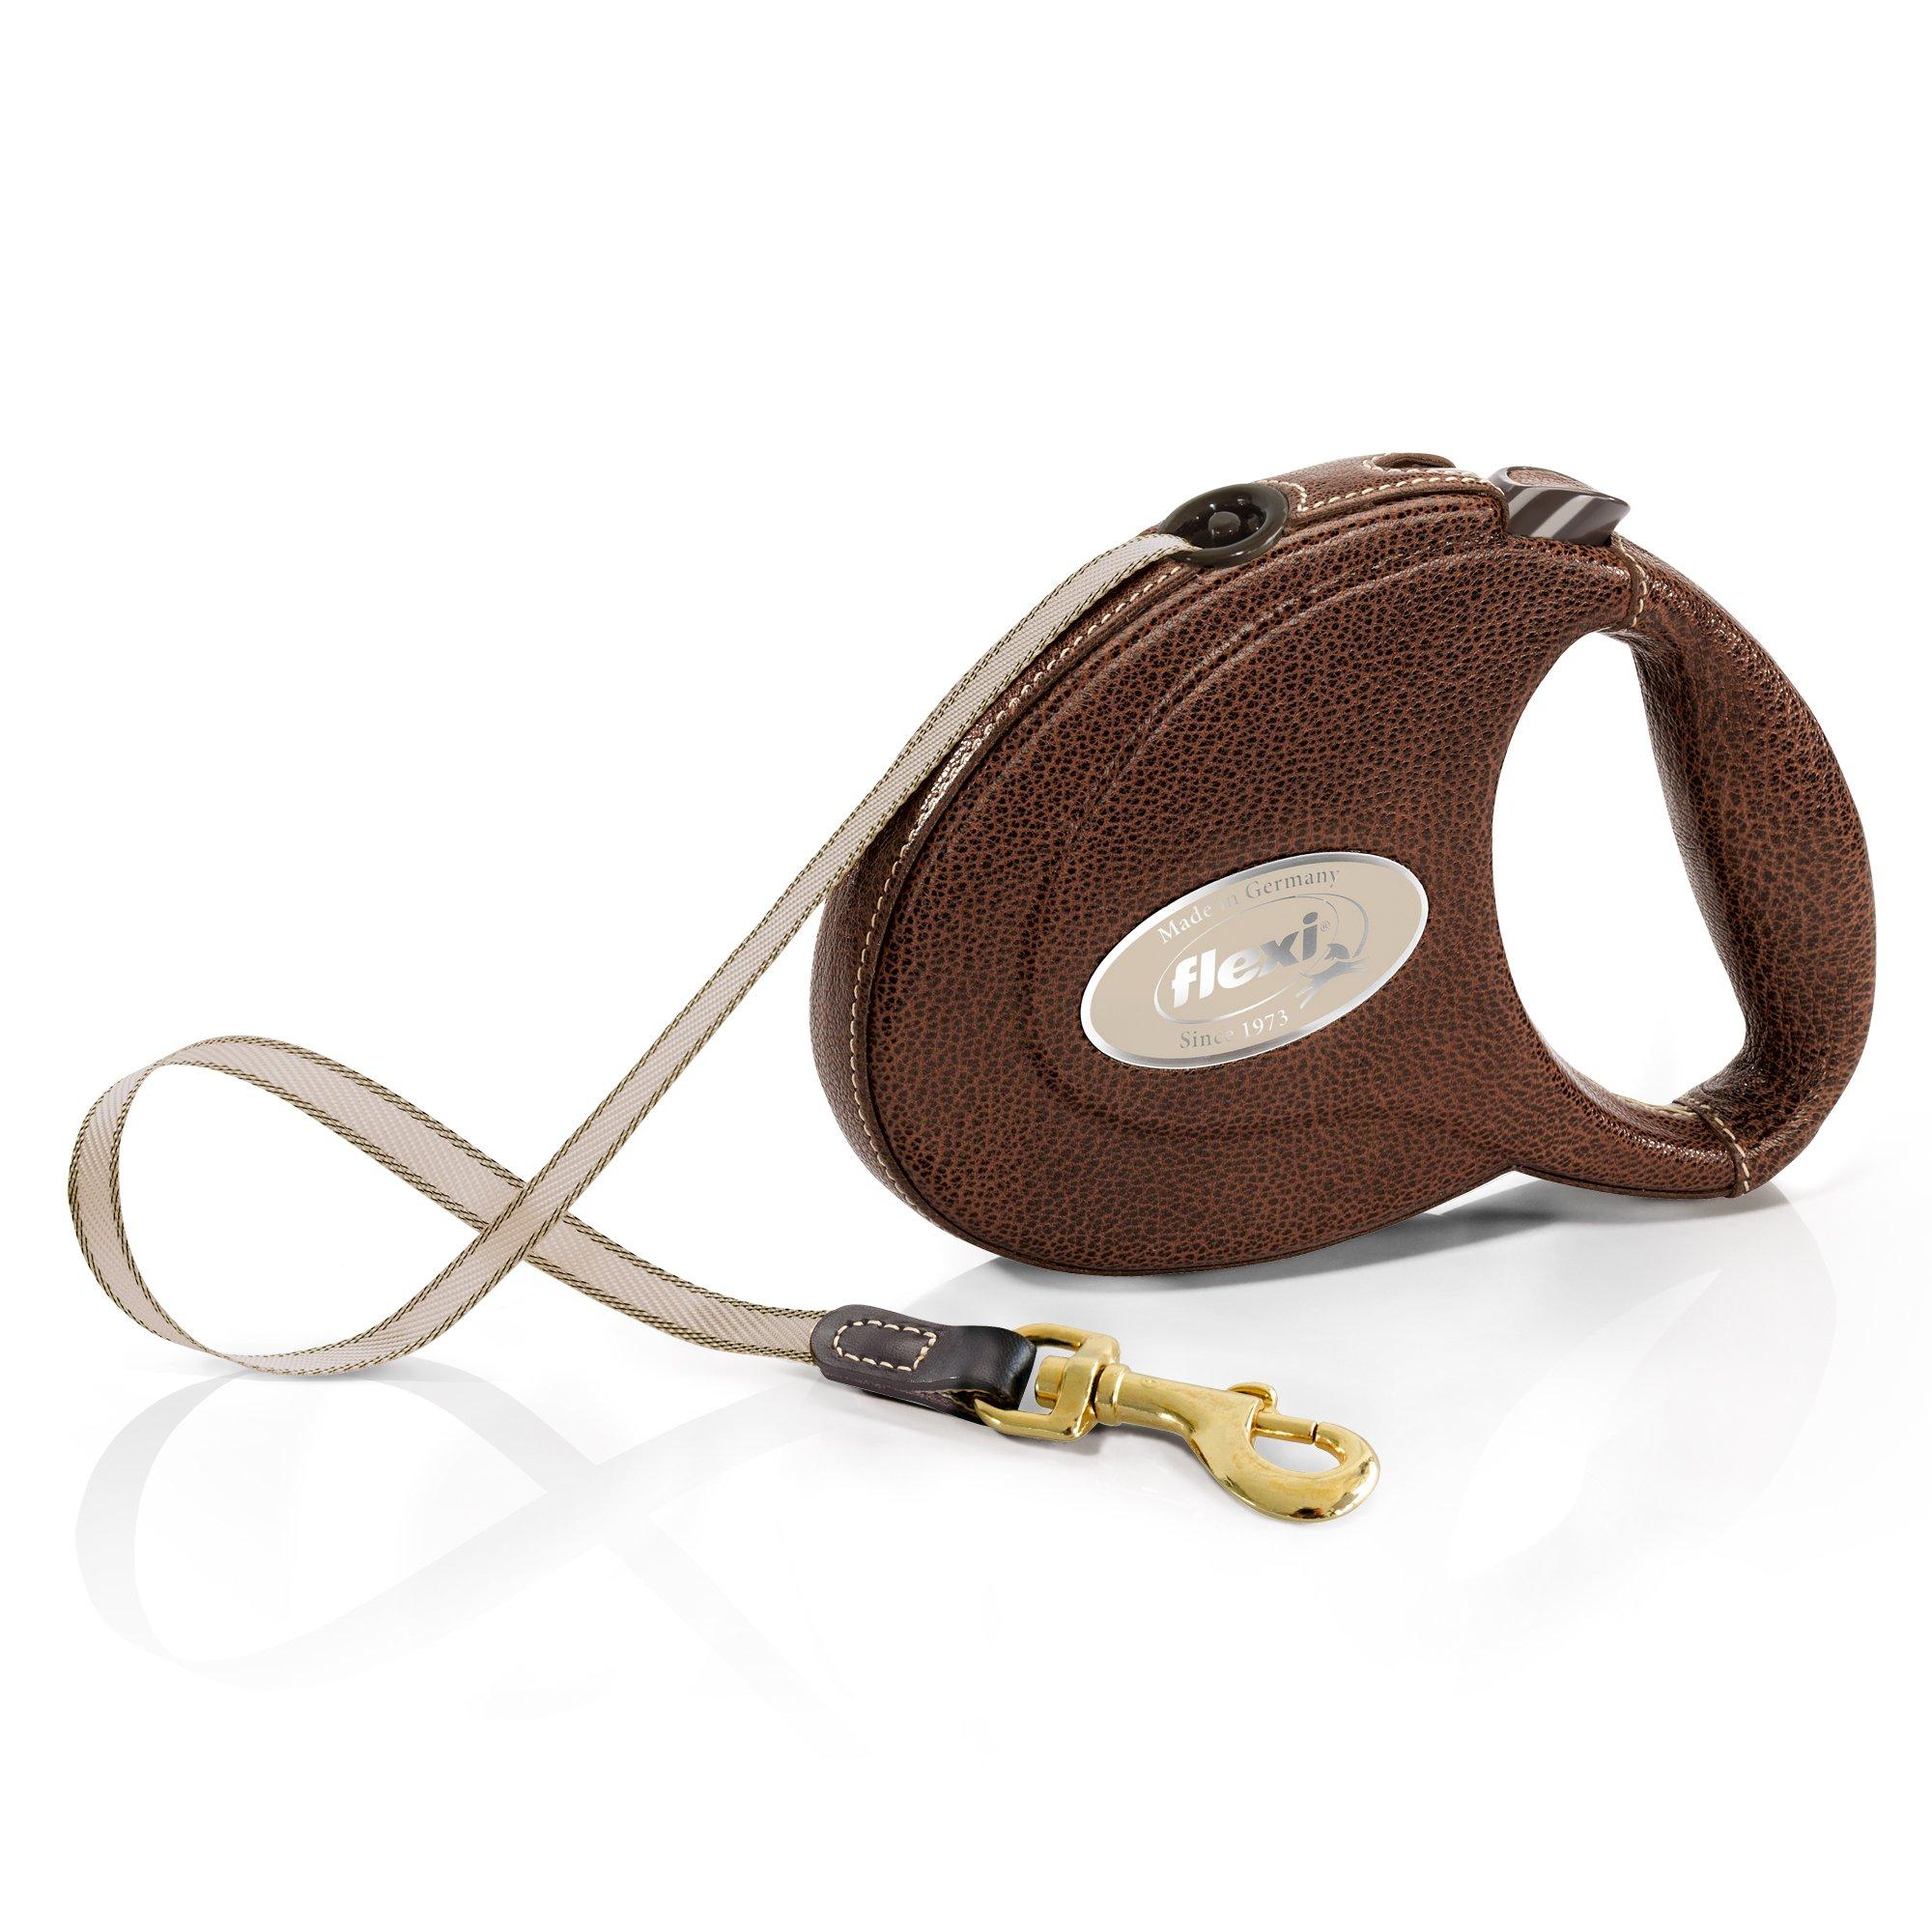 Flexi ELG.210.DB LED.12 Leather Tape 5 m, Medium, Brown